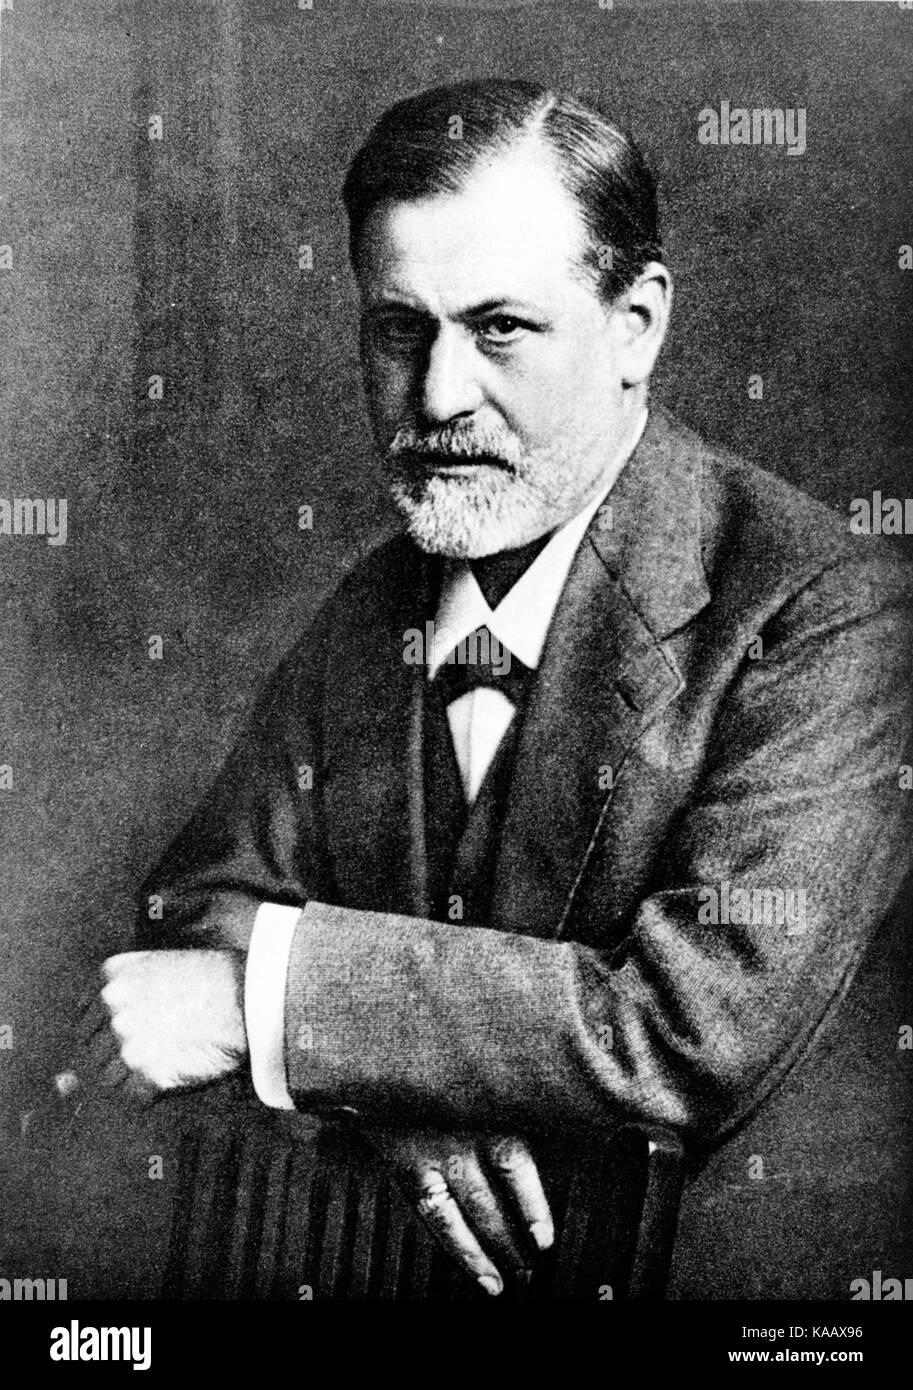 Sigmund Freud by Max Halberstadt 1909 cph.3c33801 - Stock Image